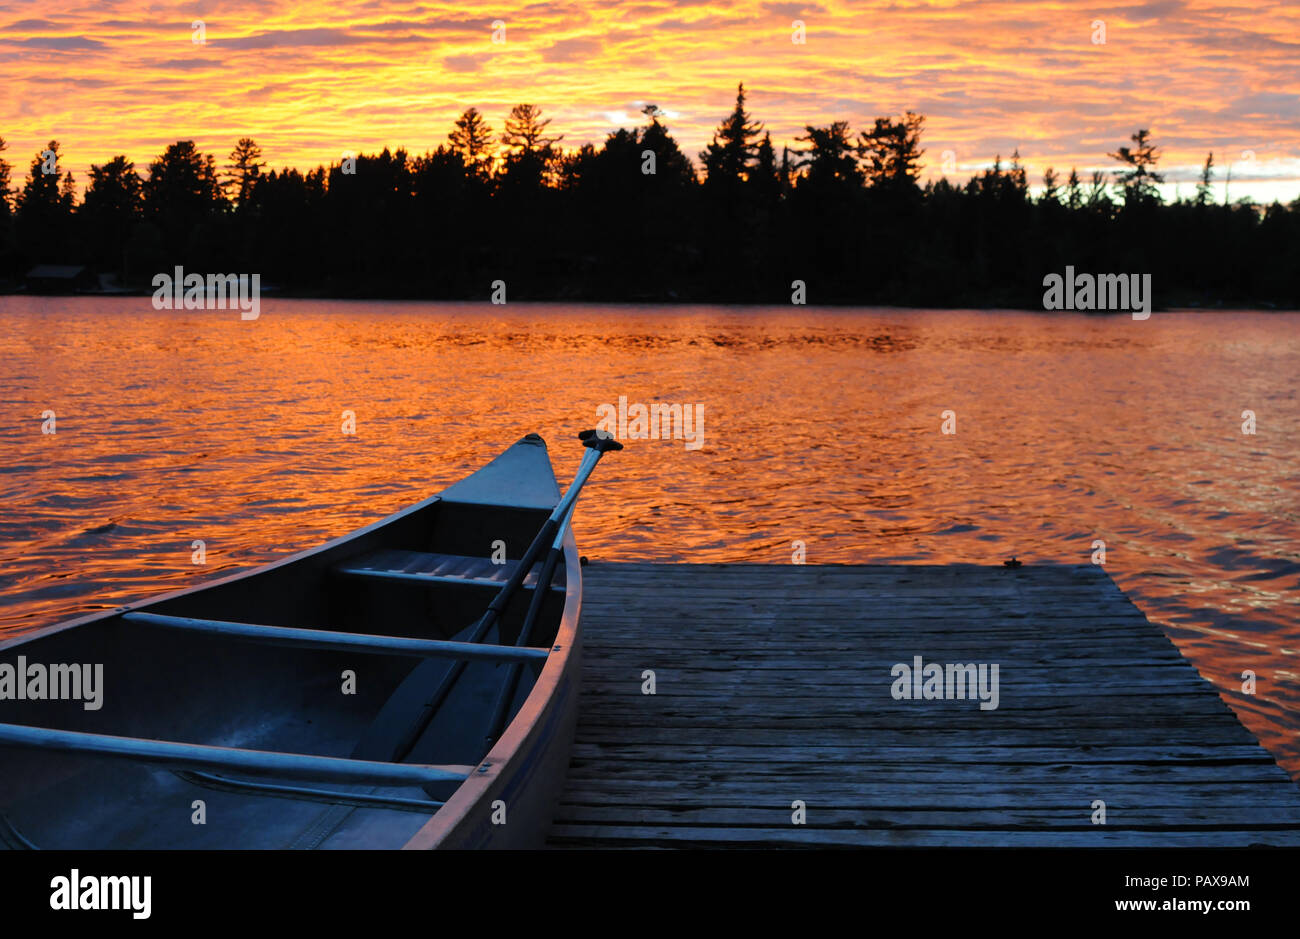 Canoe on dock at sunset sunrise on Lake One in the Boundary Waters Canoe Area near Ely Minnesota - Stock Image